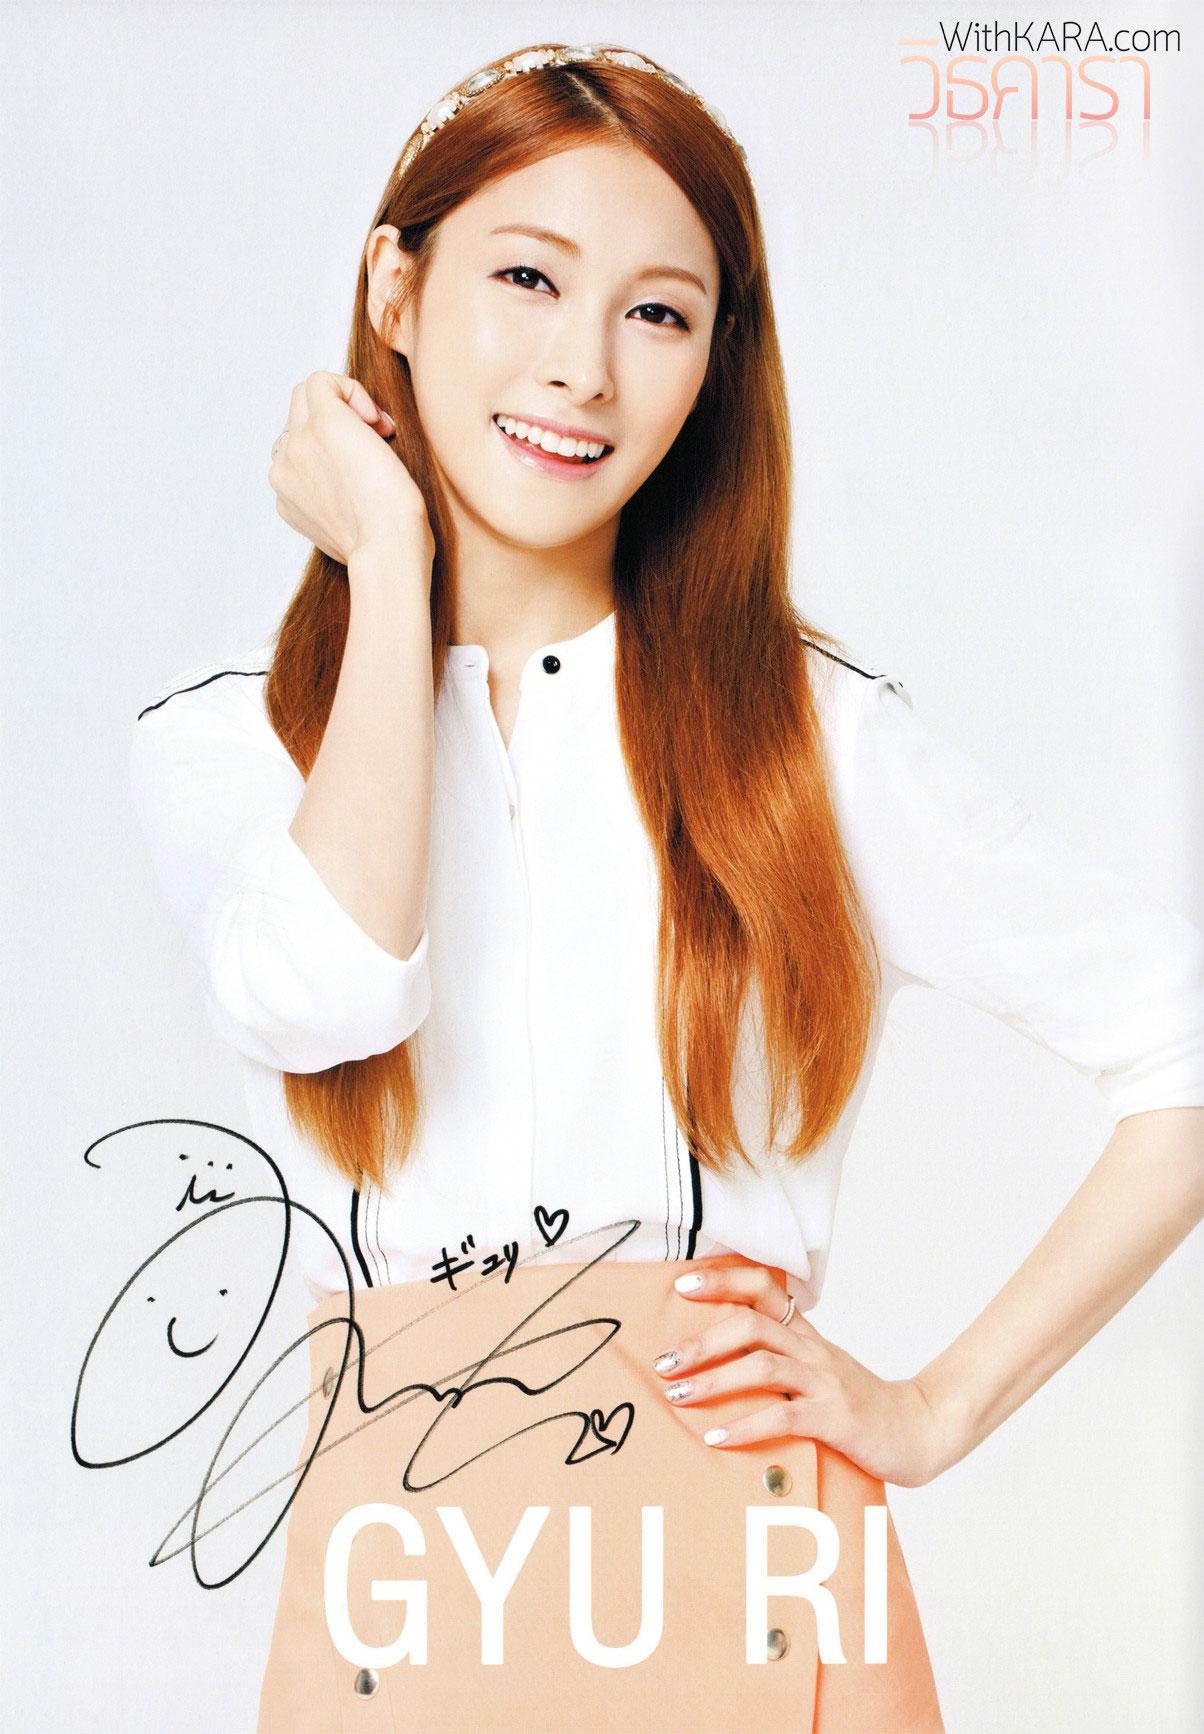 KARA Gyuri 3rd Japan Tour Photobook